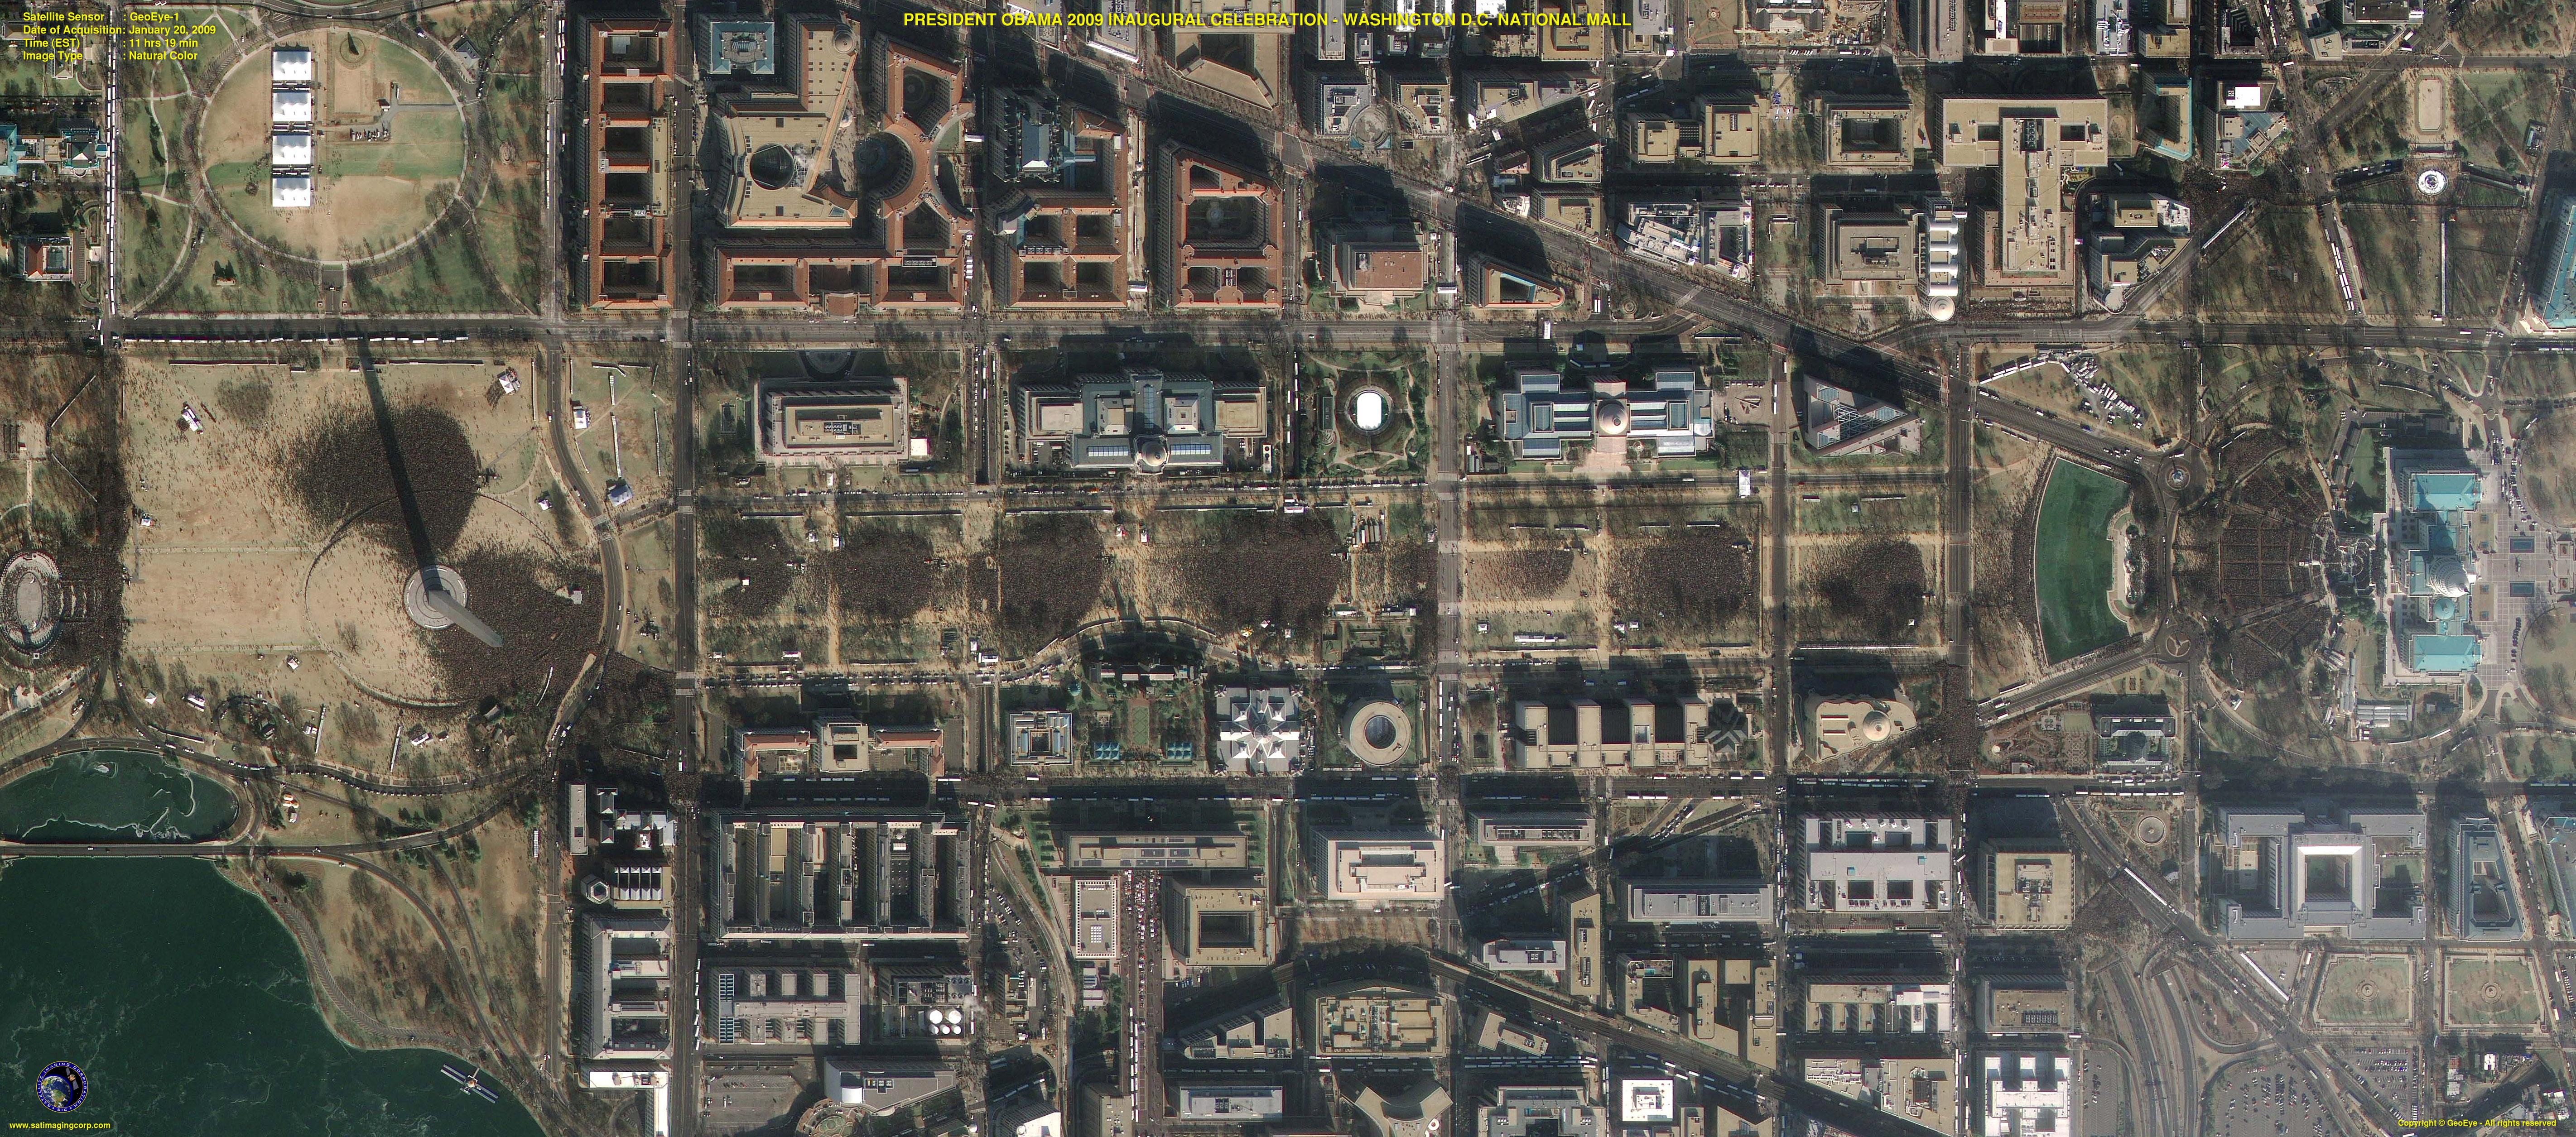 Geoeye 1 Satellite Image Obama Inauguration Satellite